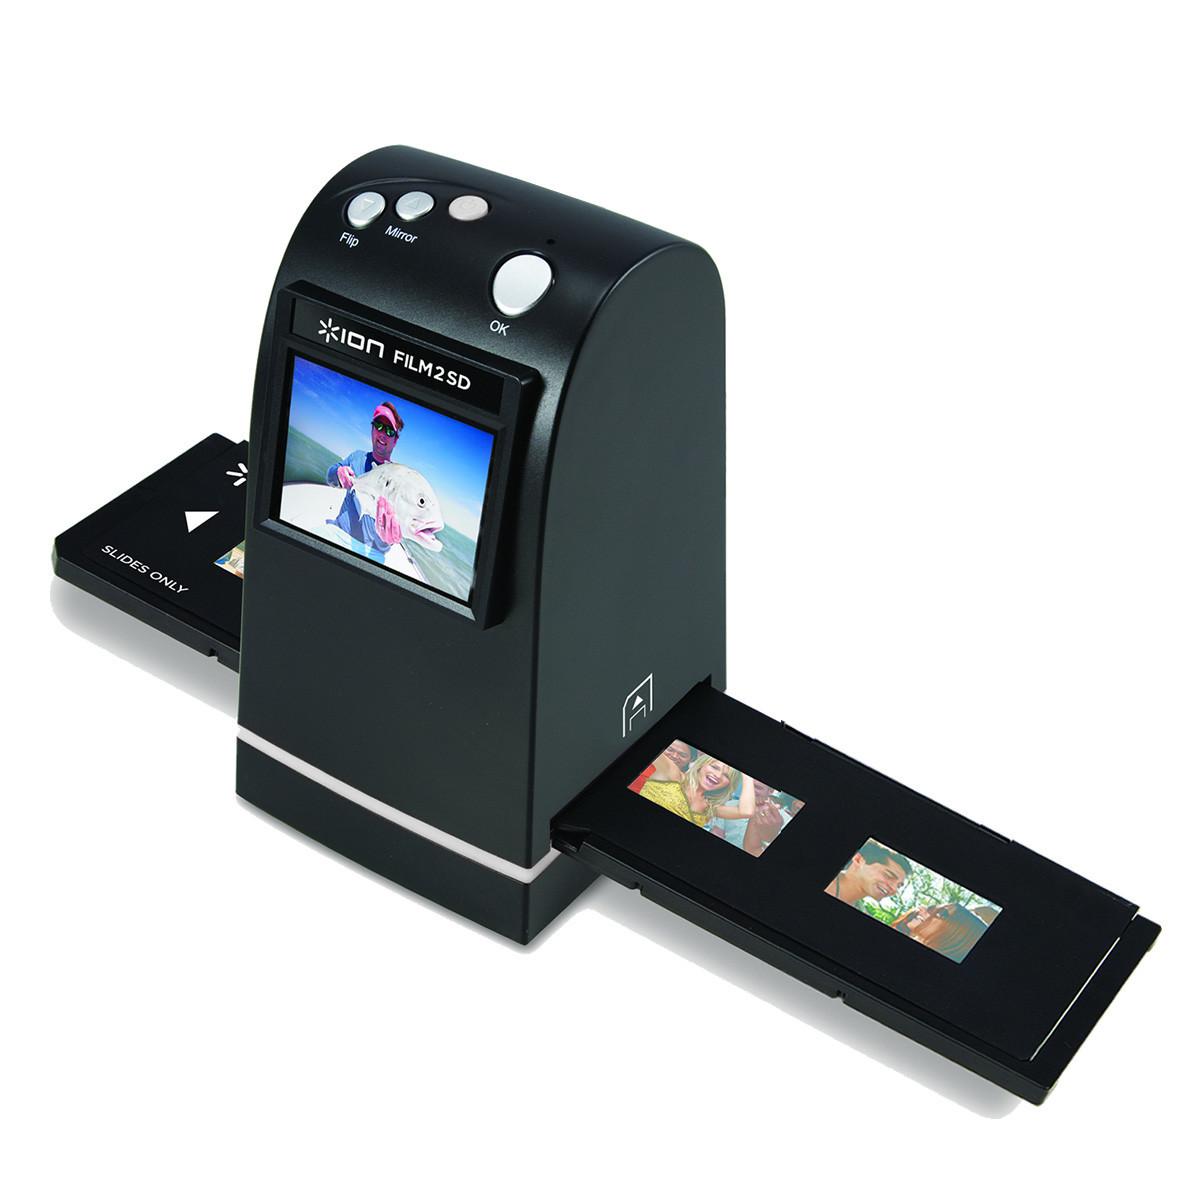 ION Film 2 SD MK2 35mm Film + Slide Scanner - Nearly New